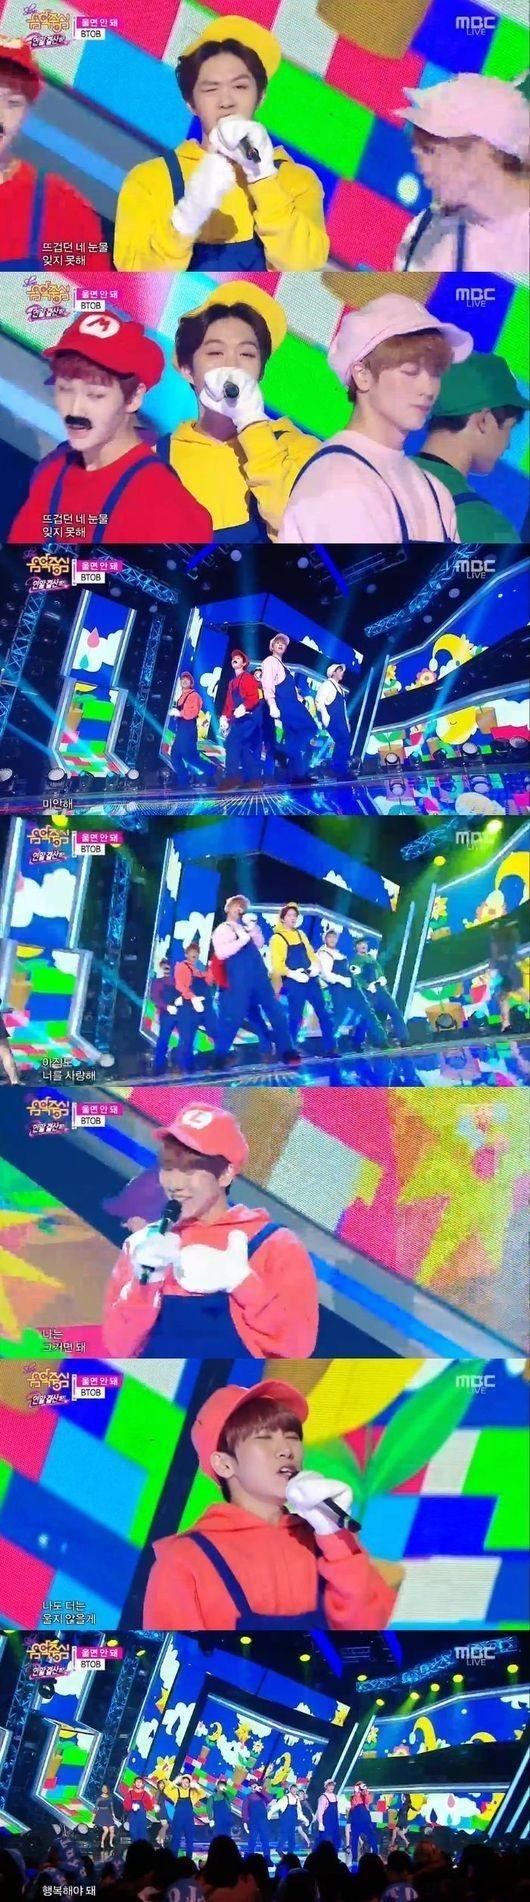 BTOB、スーパーマリオに変身…「音楽中心」でキュートな魅力を披露